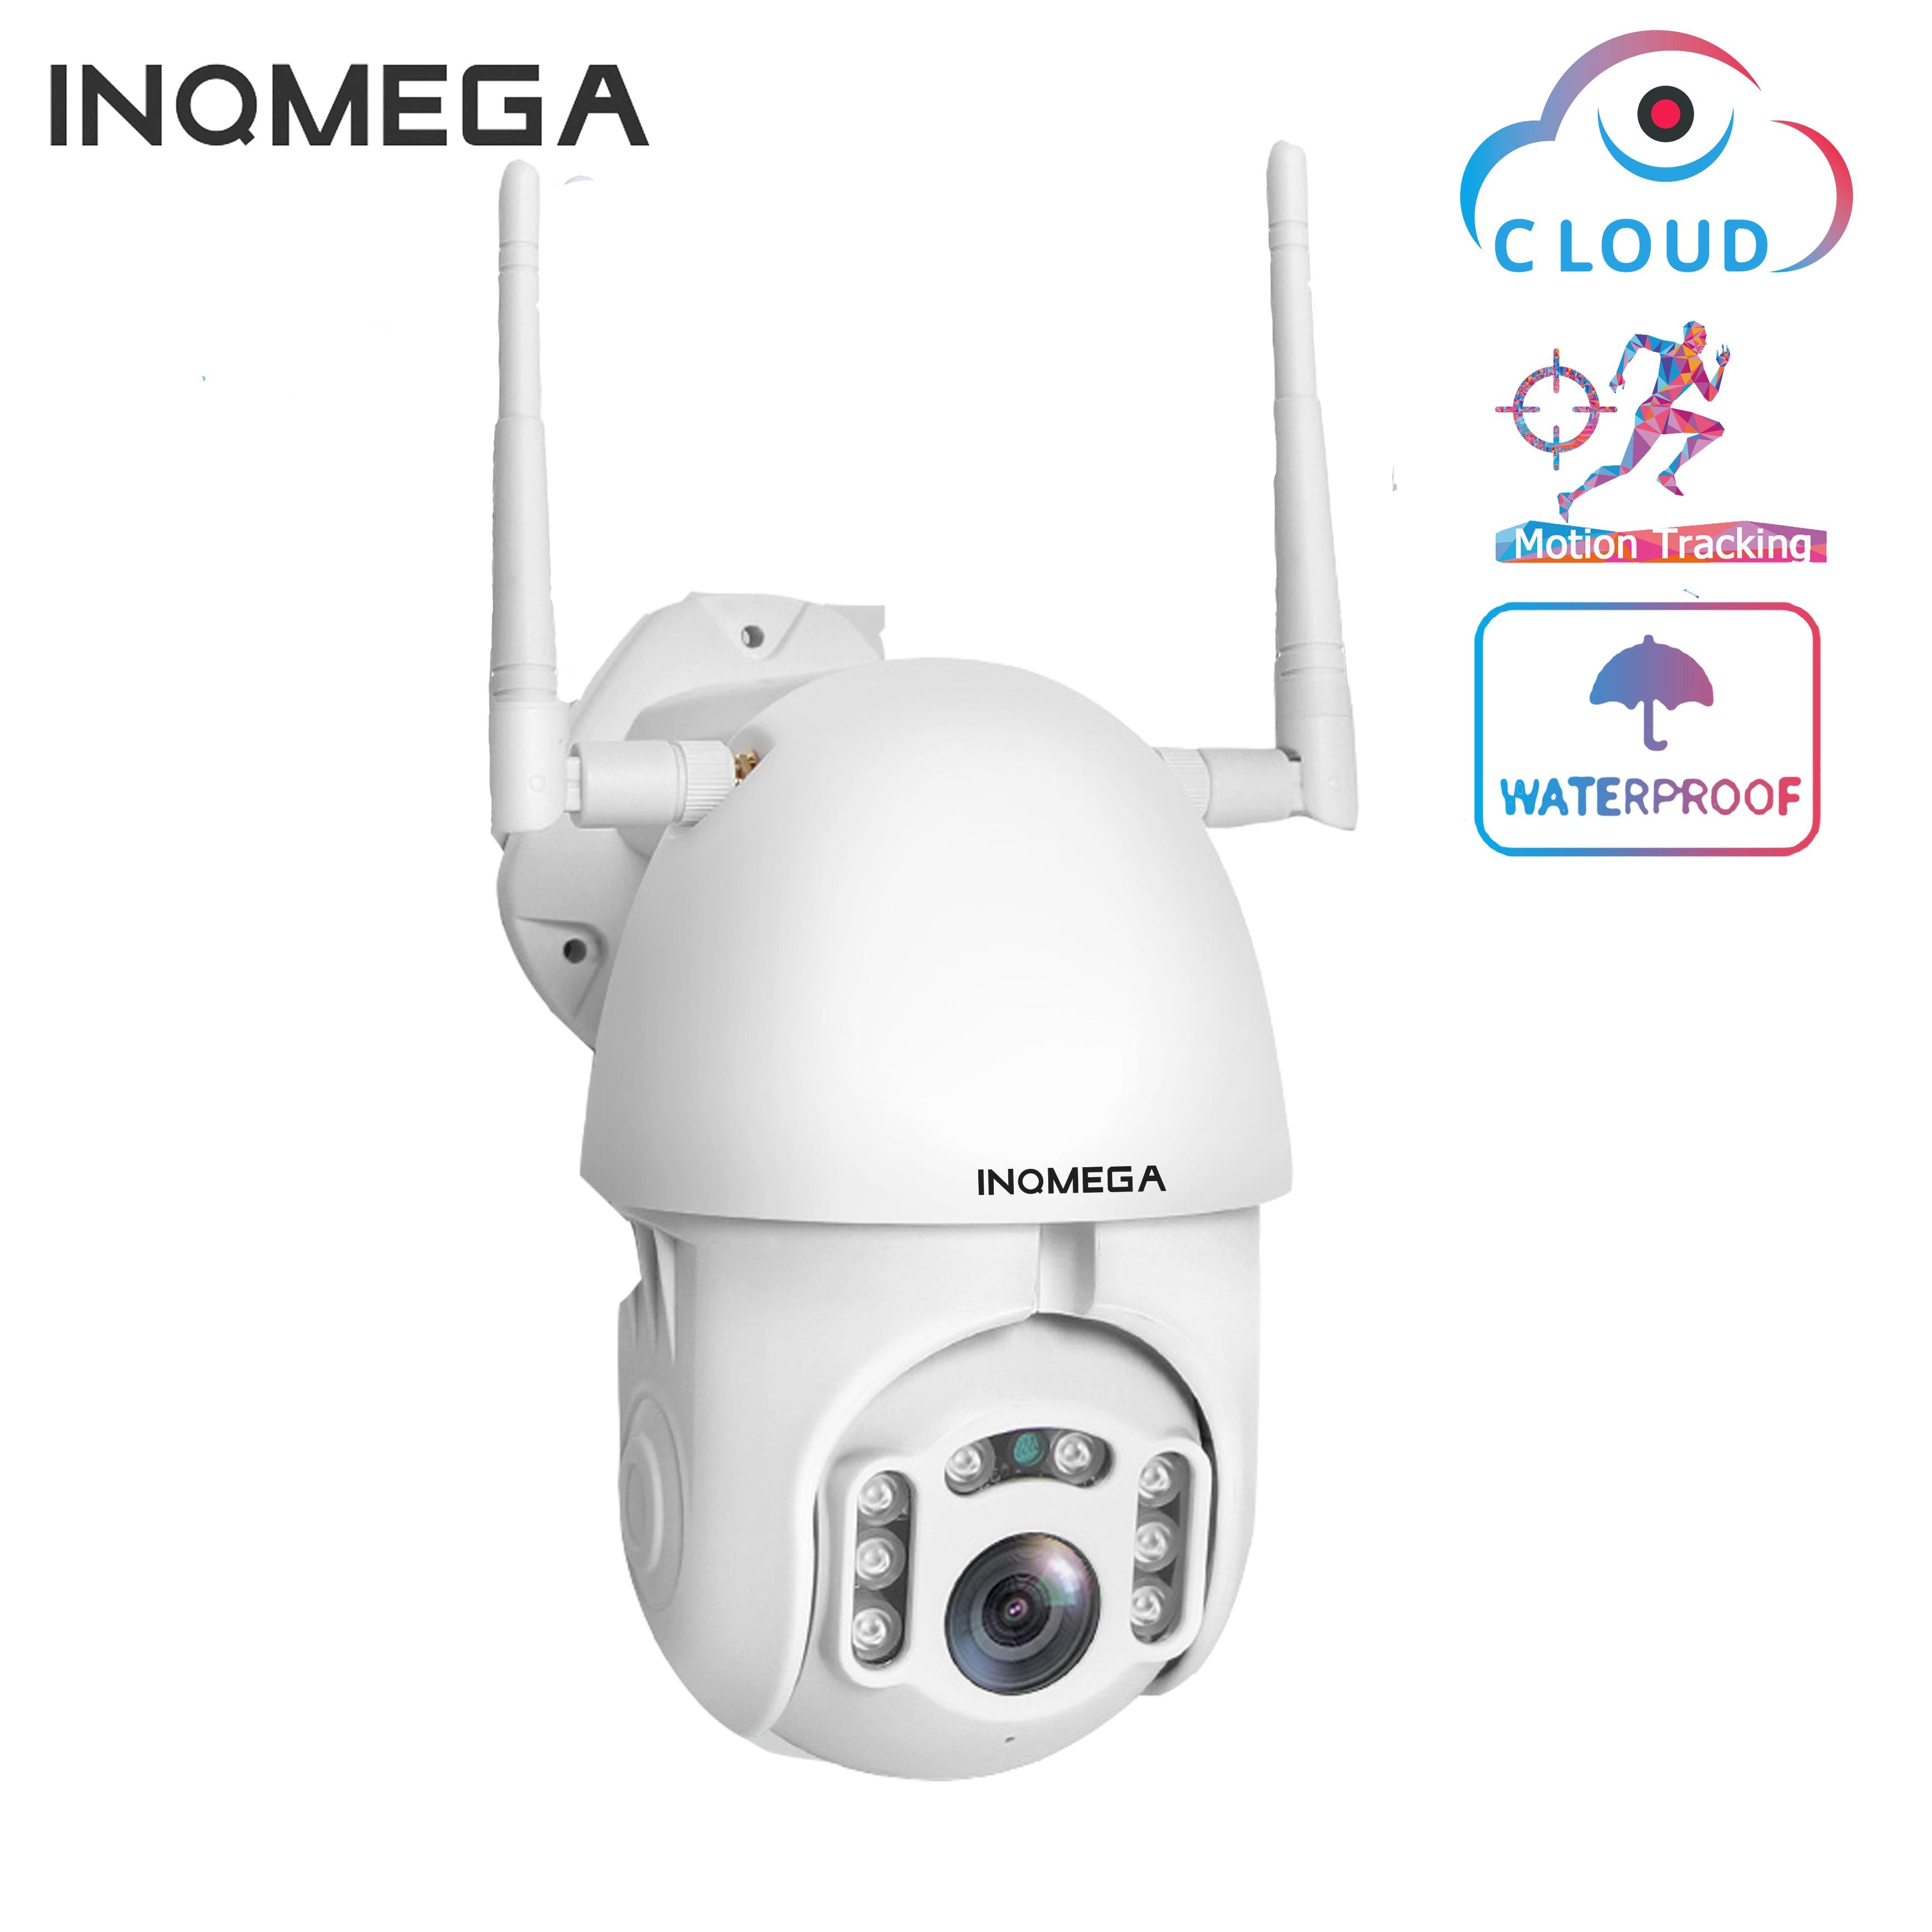 INQMEGA-caméra Wifi 1080P   Caméra sans fil IP Auto trackingz, dôme de vitesse CCTV, caméra IR Onvif, Surveillance de sécurité extérieure H.264 IR 50